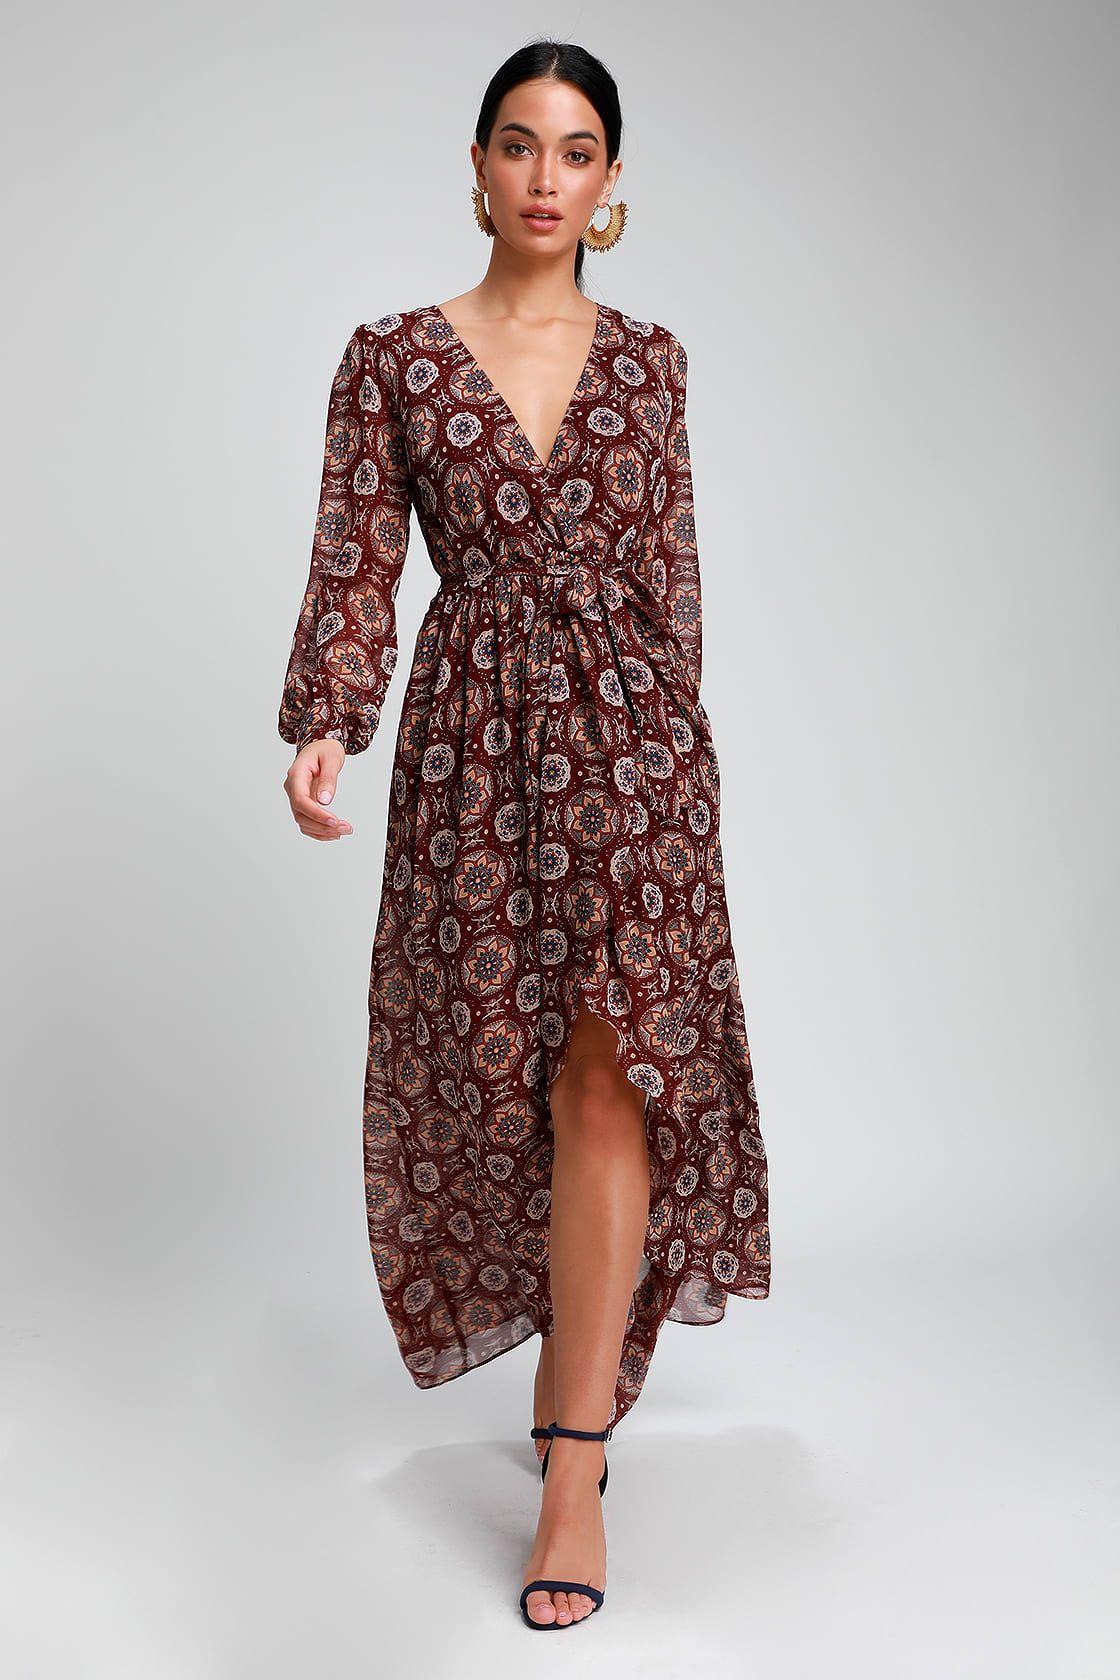 Art And Soul Burgundy Multi Print Long Sleeve High Low Dress Long Sleeve High Low Dress High Low Dress Dresses [ 1680 x 1120 Pixel ]